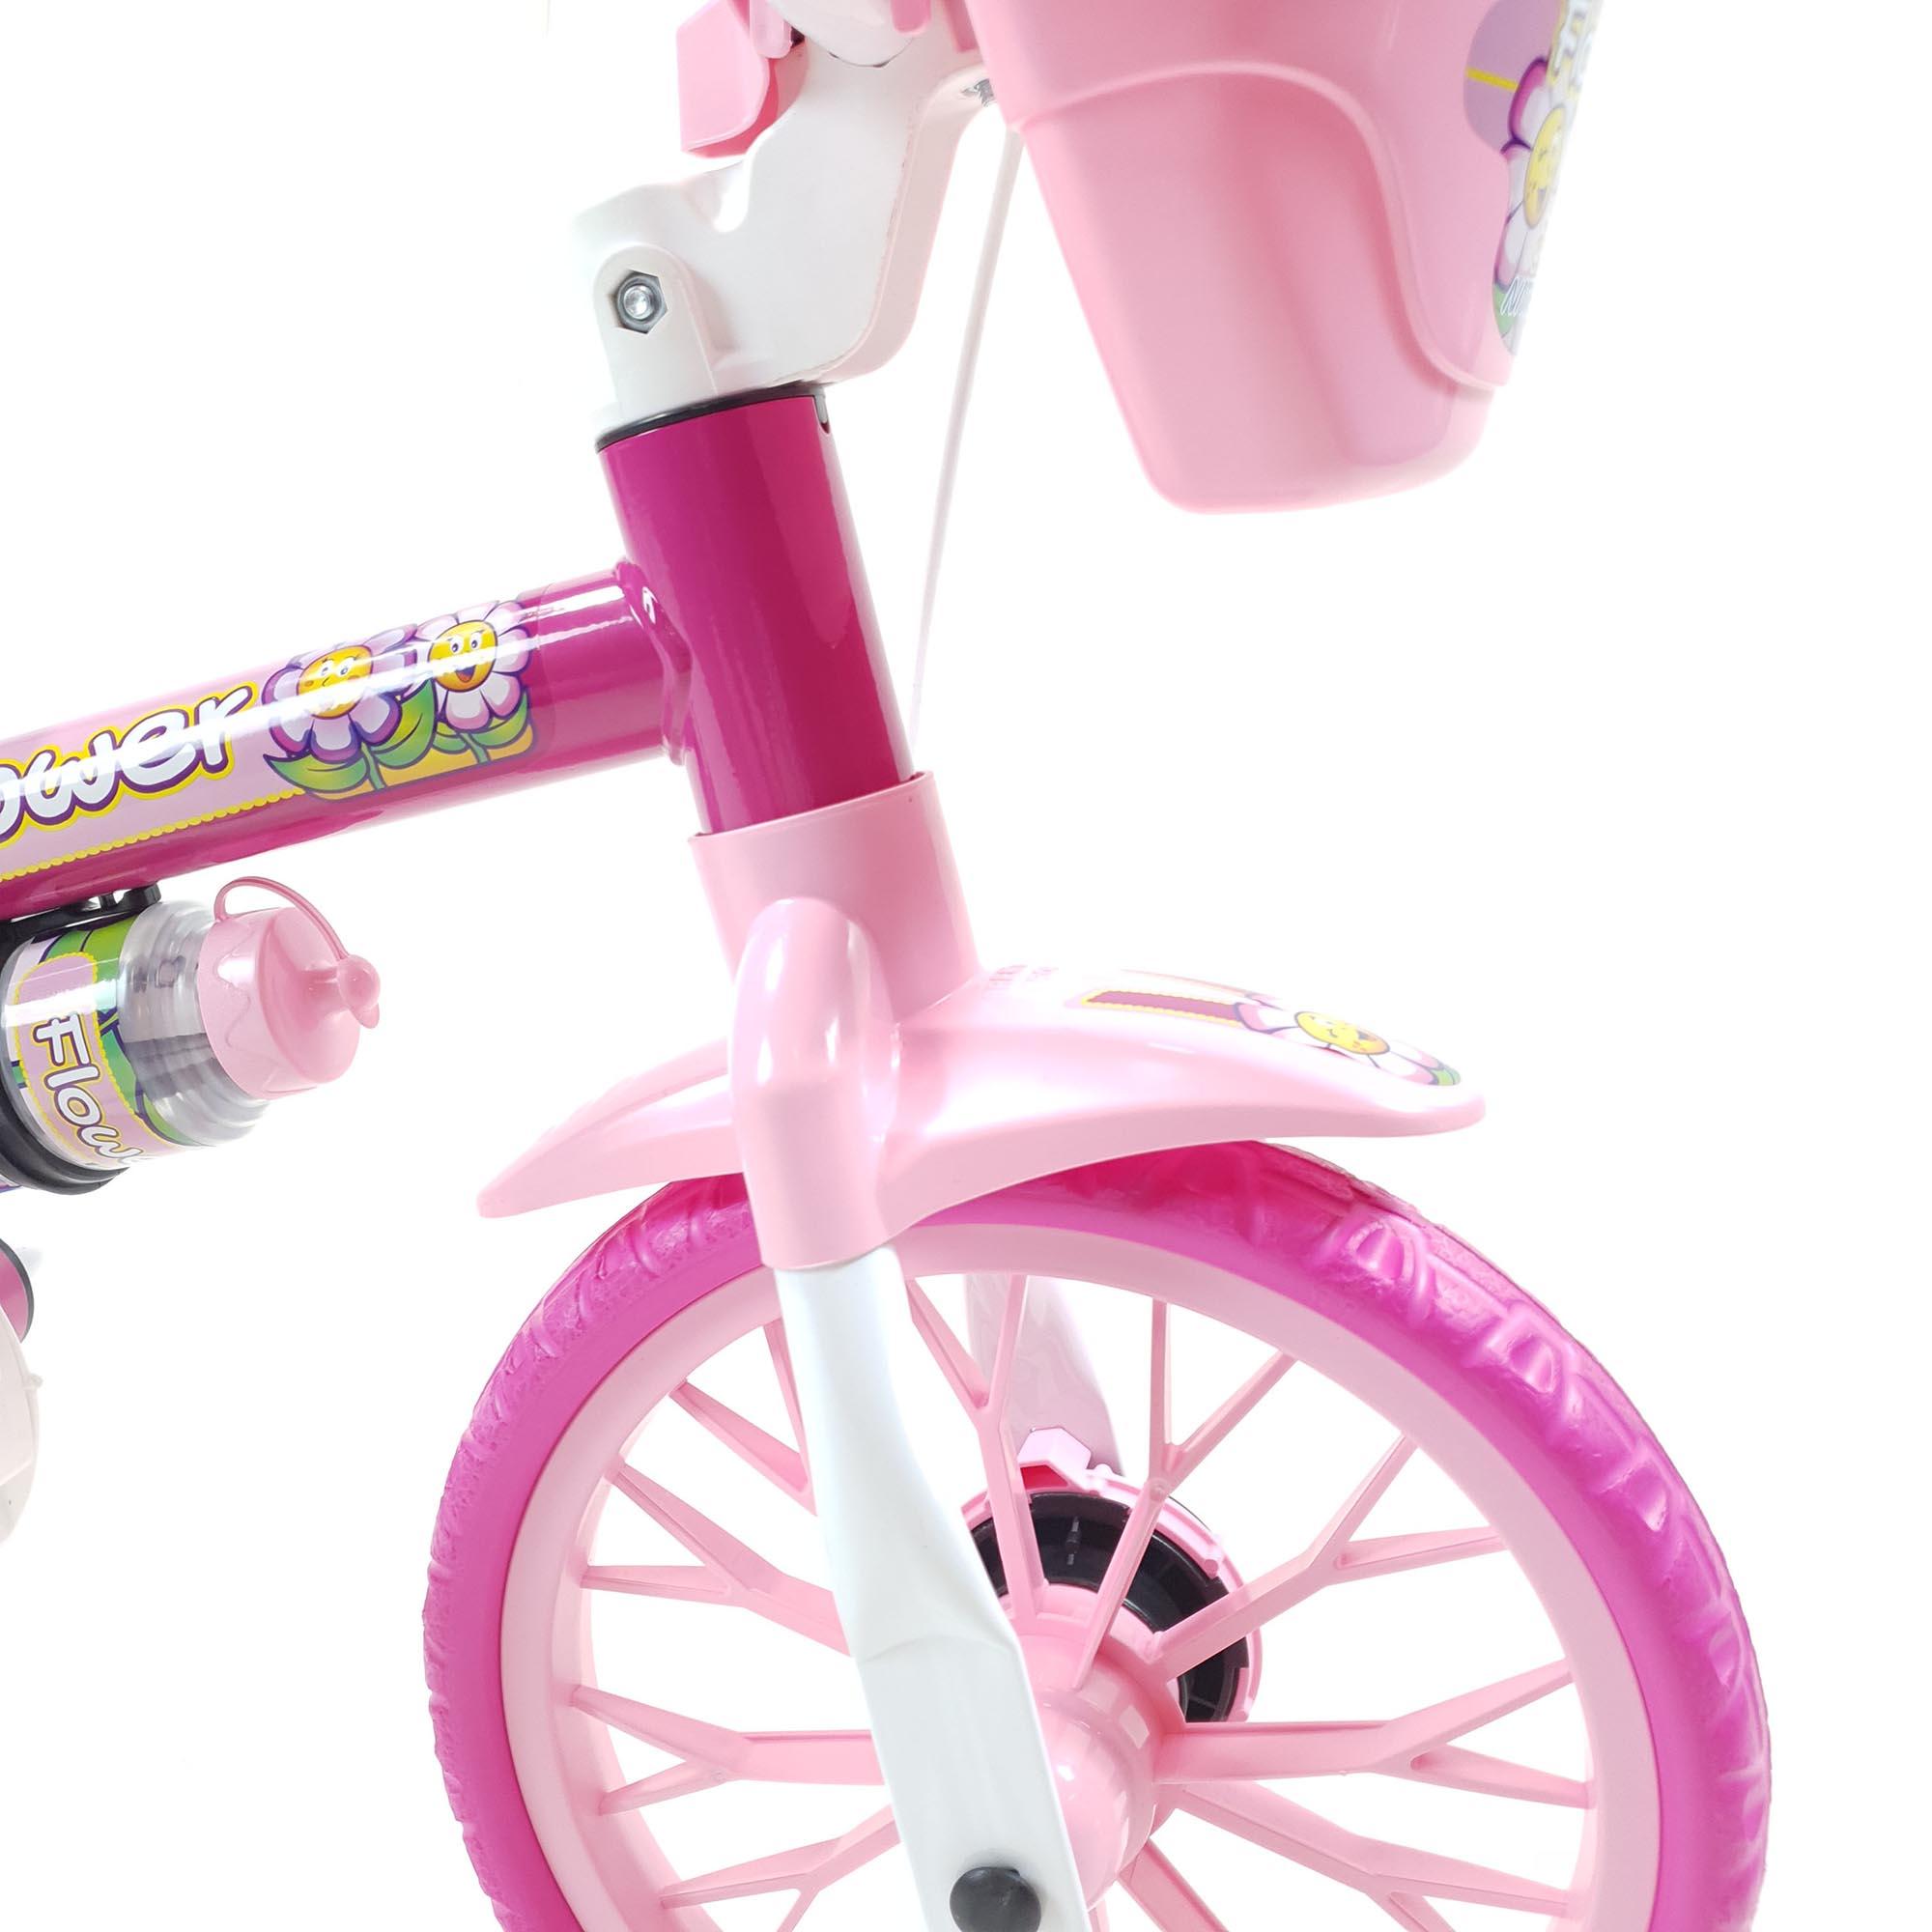 Bicicleta Nathor Infantil Aro 12 Feminina Flower Rosa